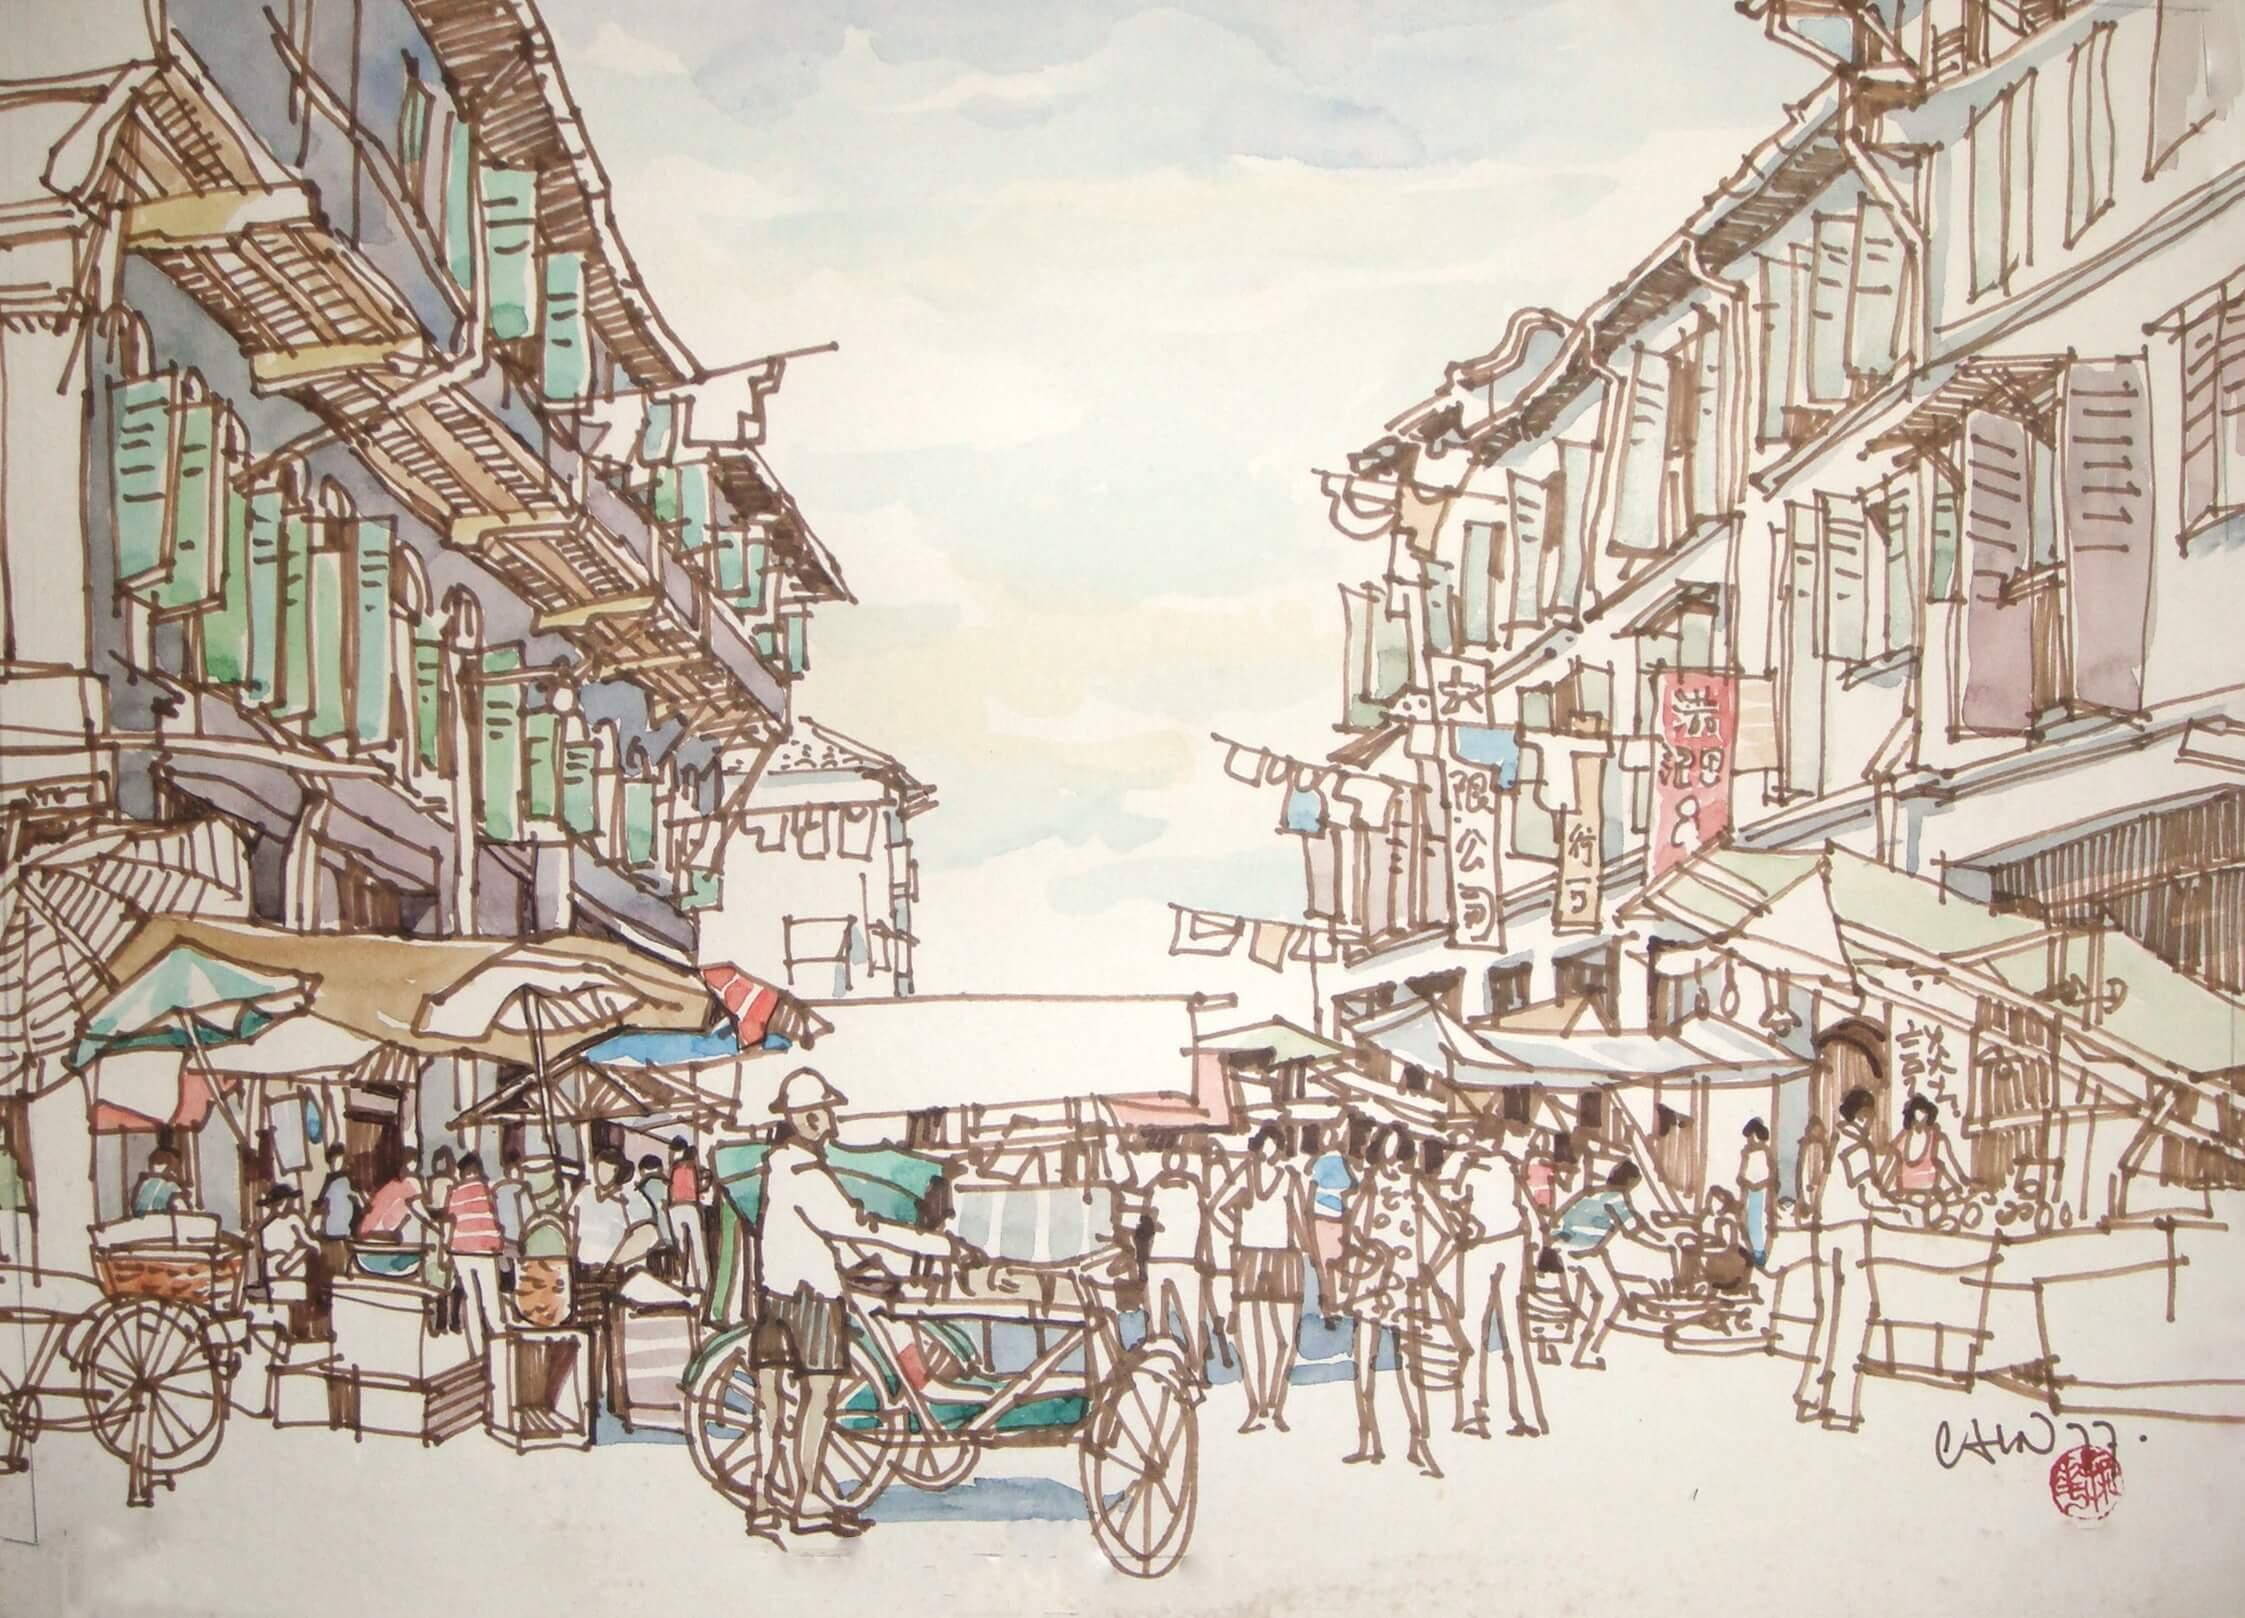 Trengganu Street – 1977 (49 cm x 34 cm)